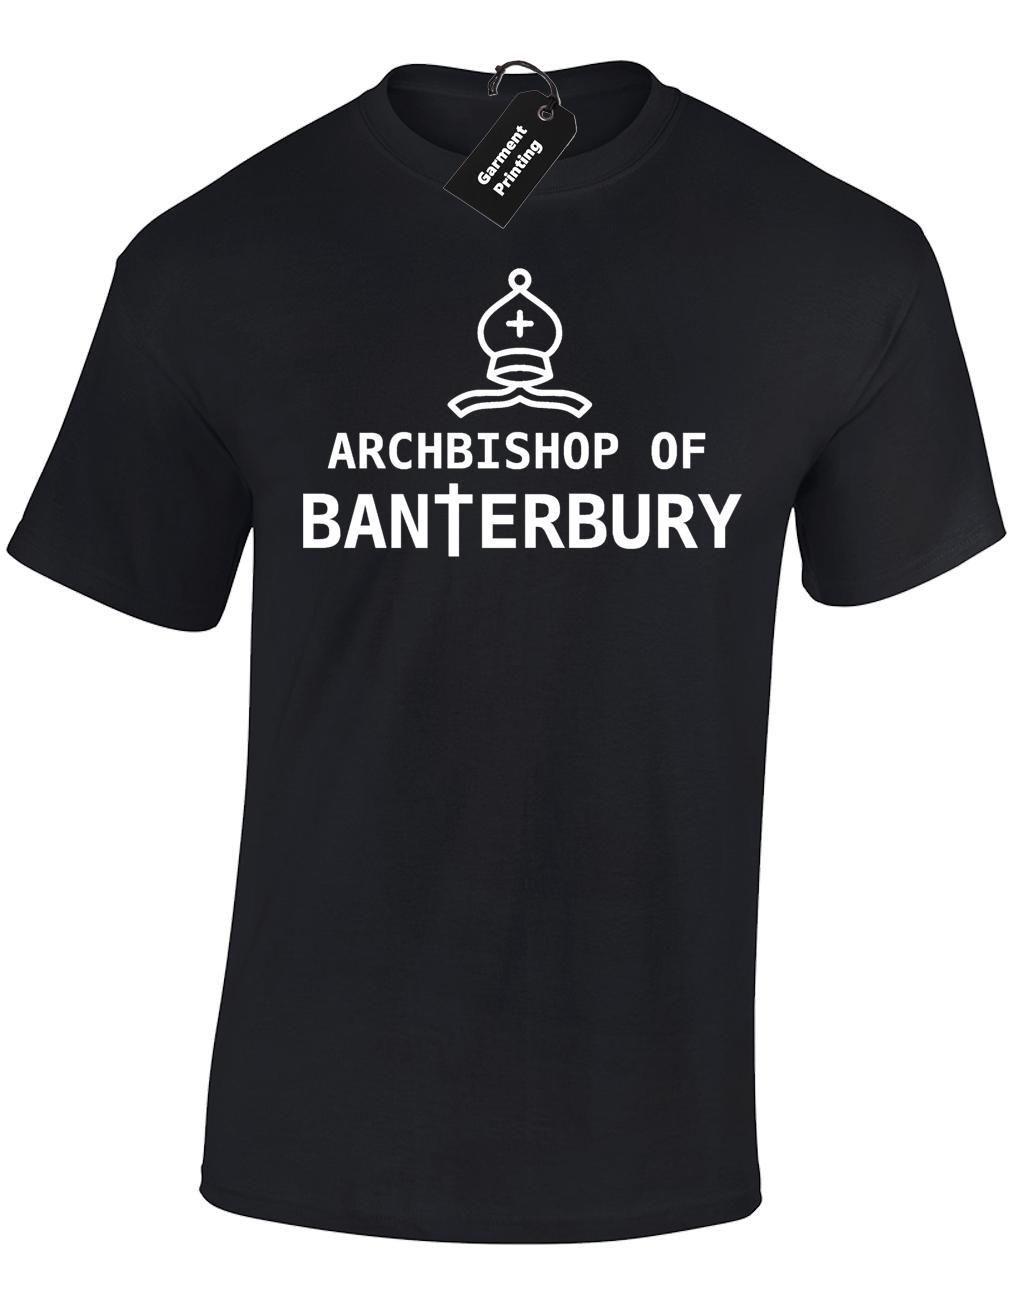 ARCHBISHOP OF BANTERBURY LADIES T SHIRT FUNNY INBETWEENERS JAY JOKE GIFT IDEA